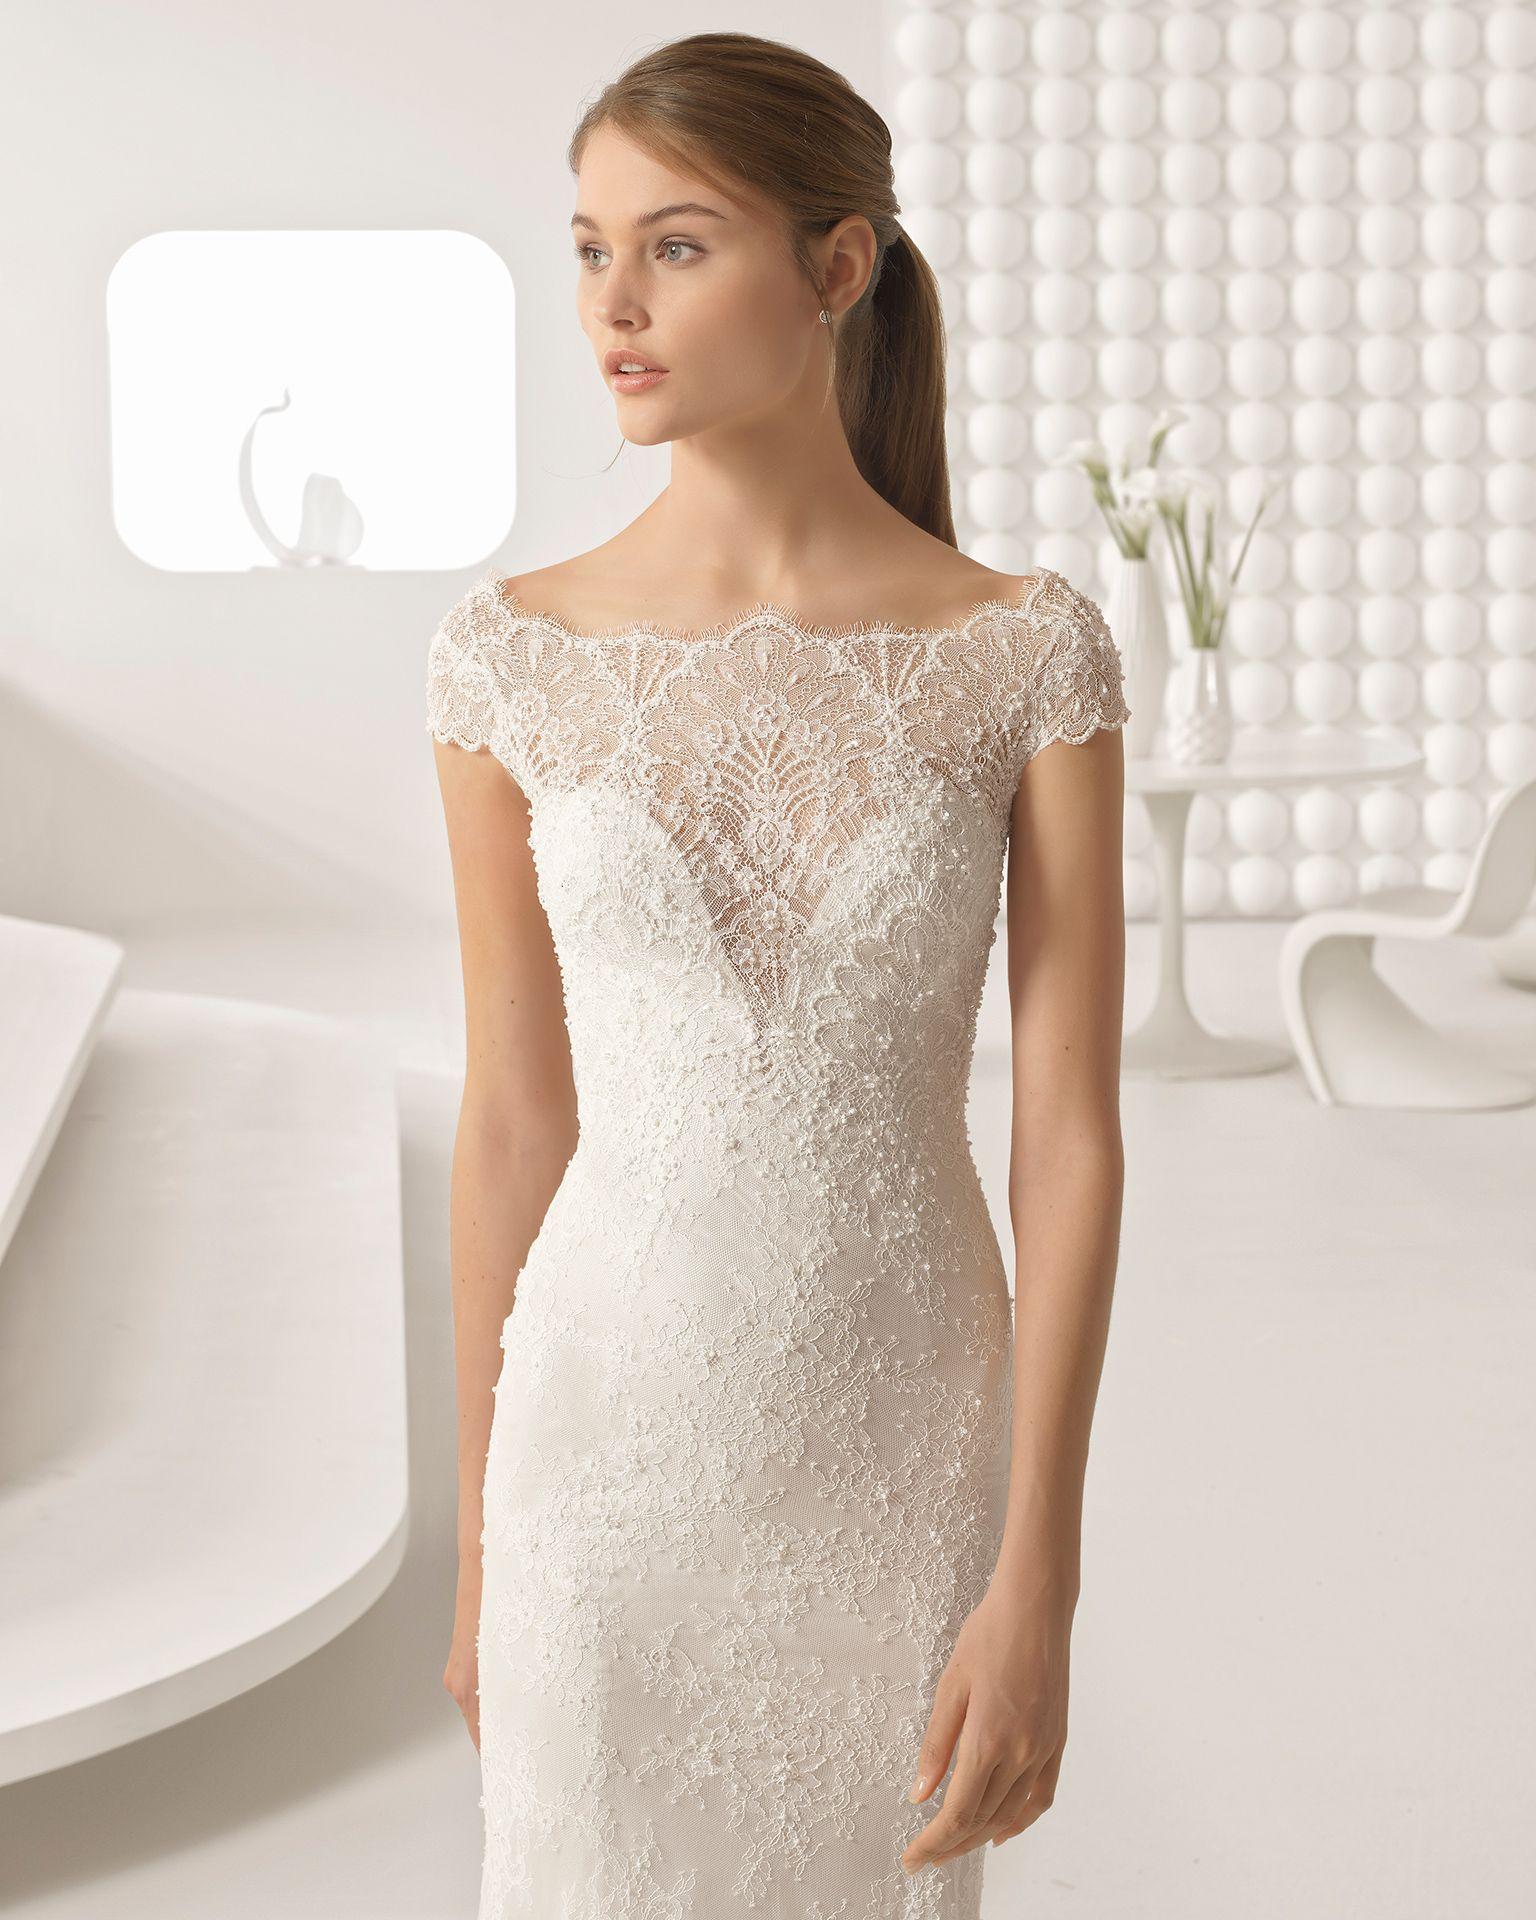 Vestido para boda civil color perla